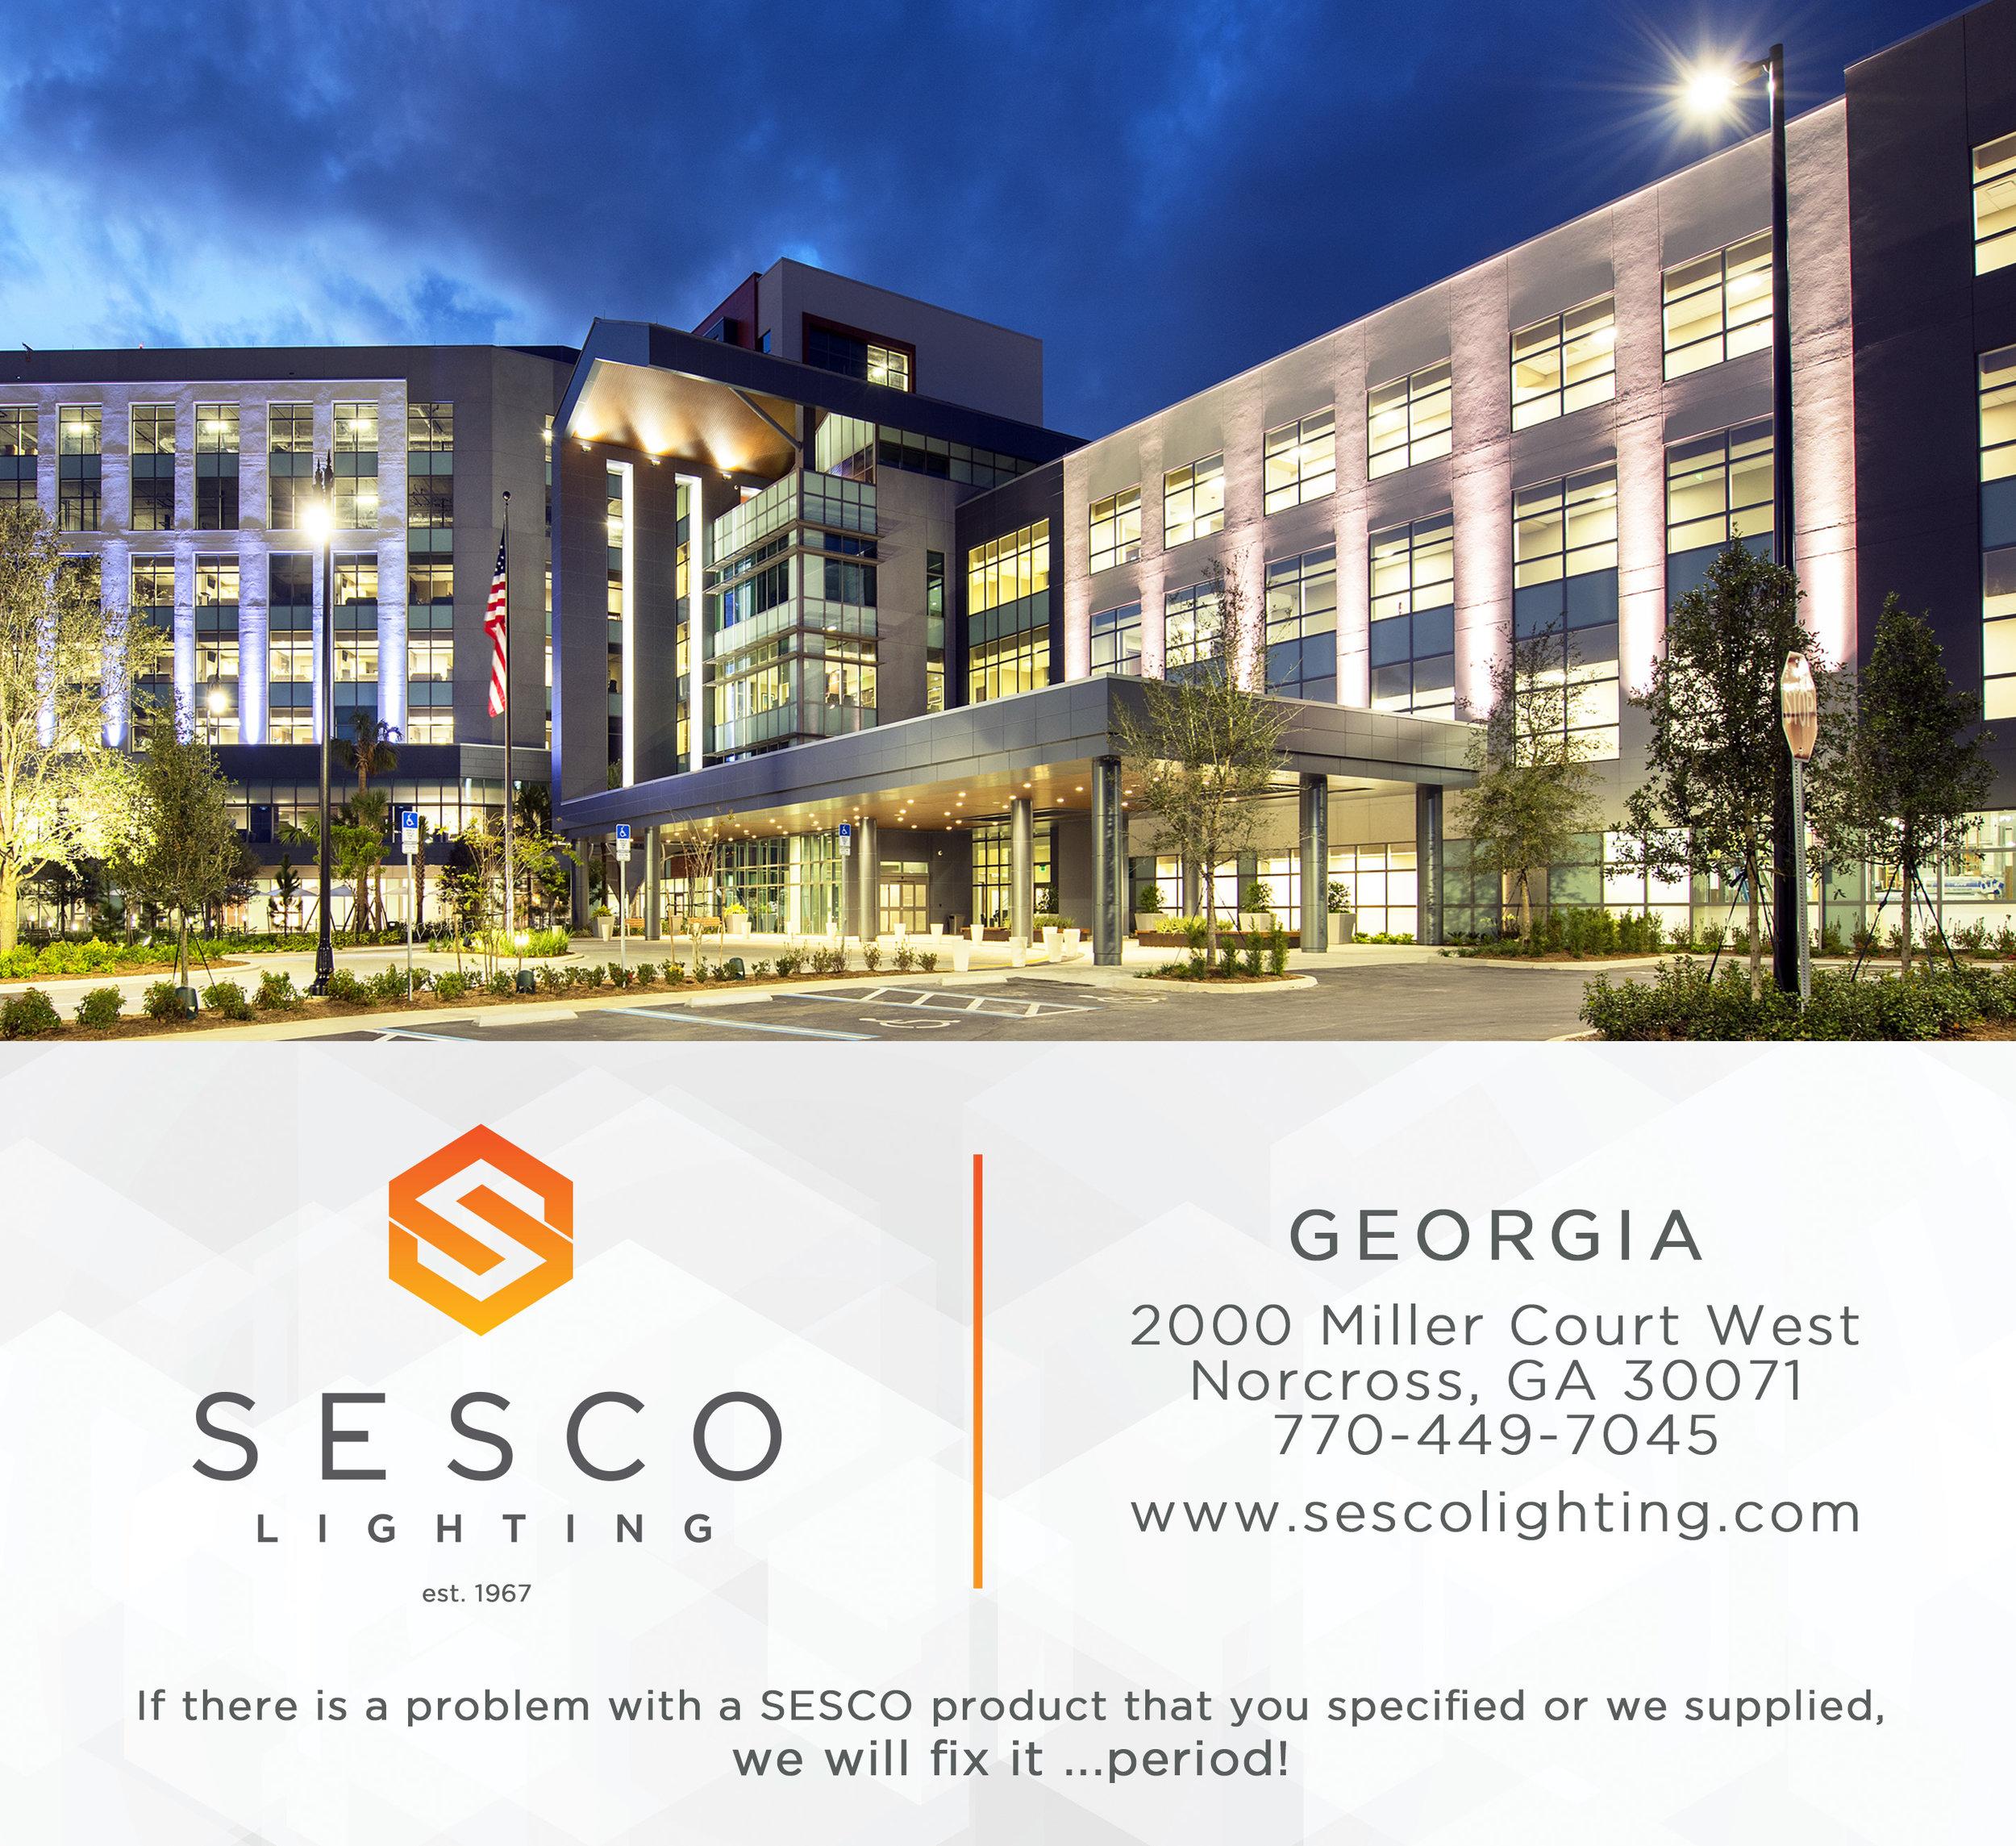 SESCO-IEC AD 2019 4.75x4.35.jpg